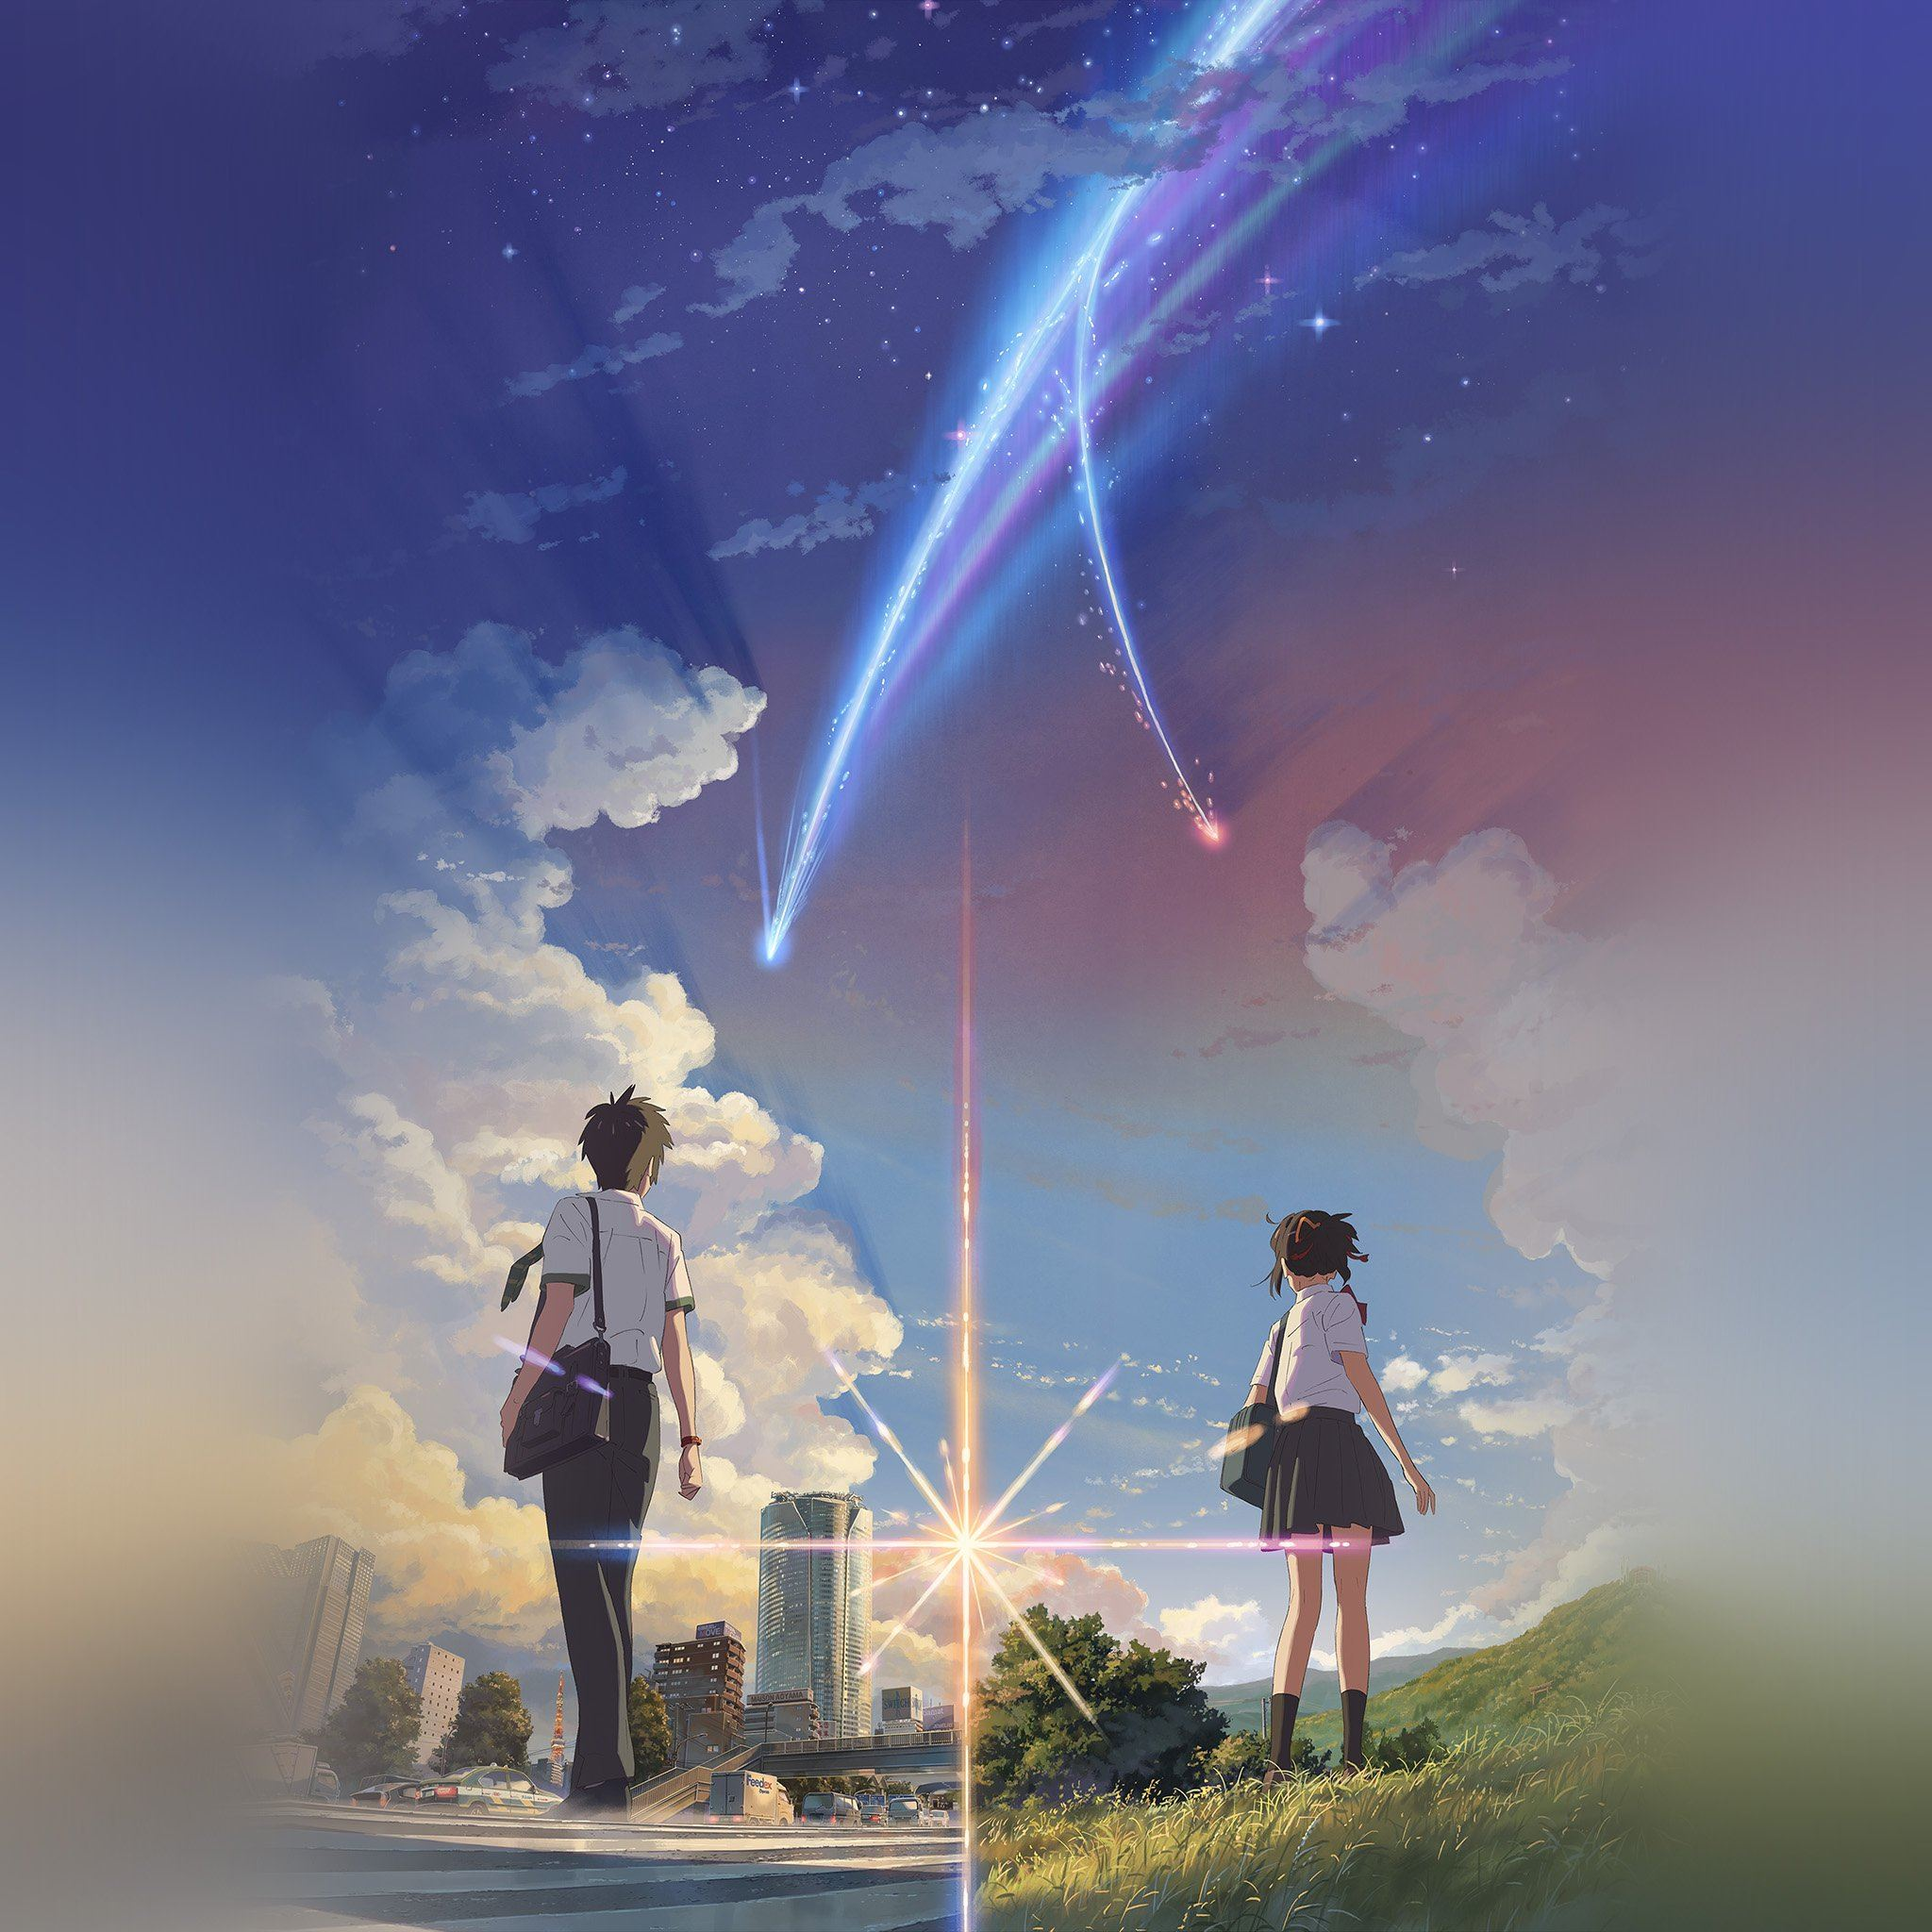 ... Boy And Girl Anime Art Spring Cute iPad Air wallpaper.